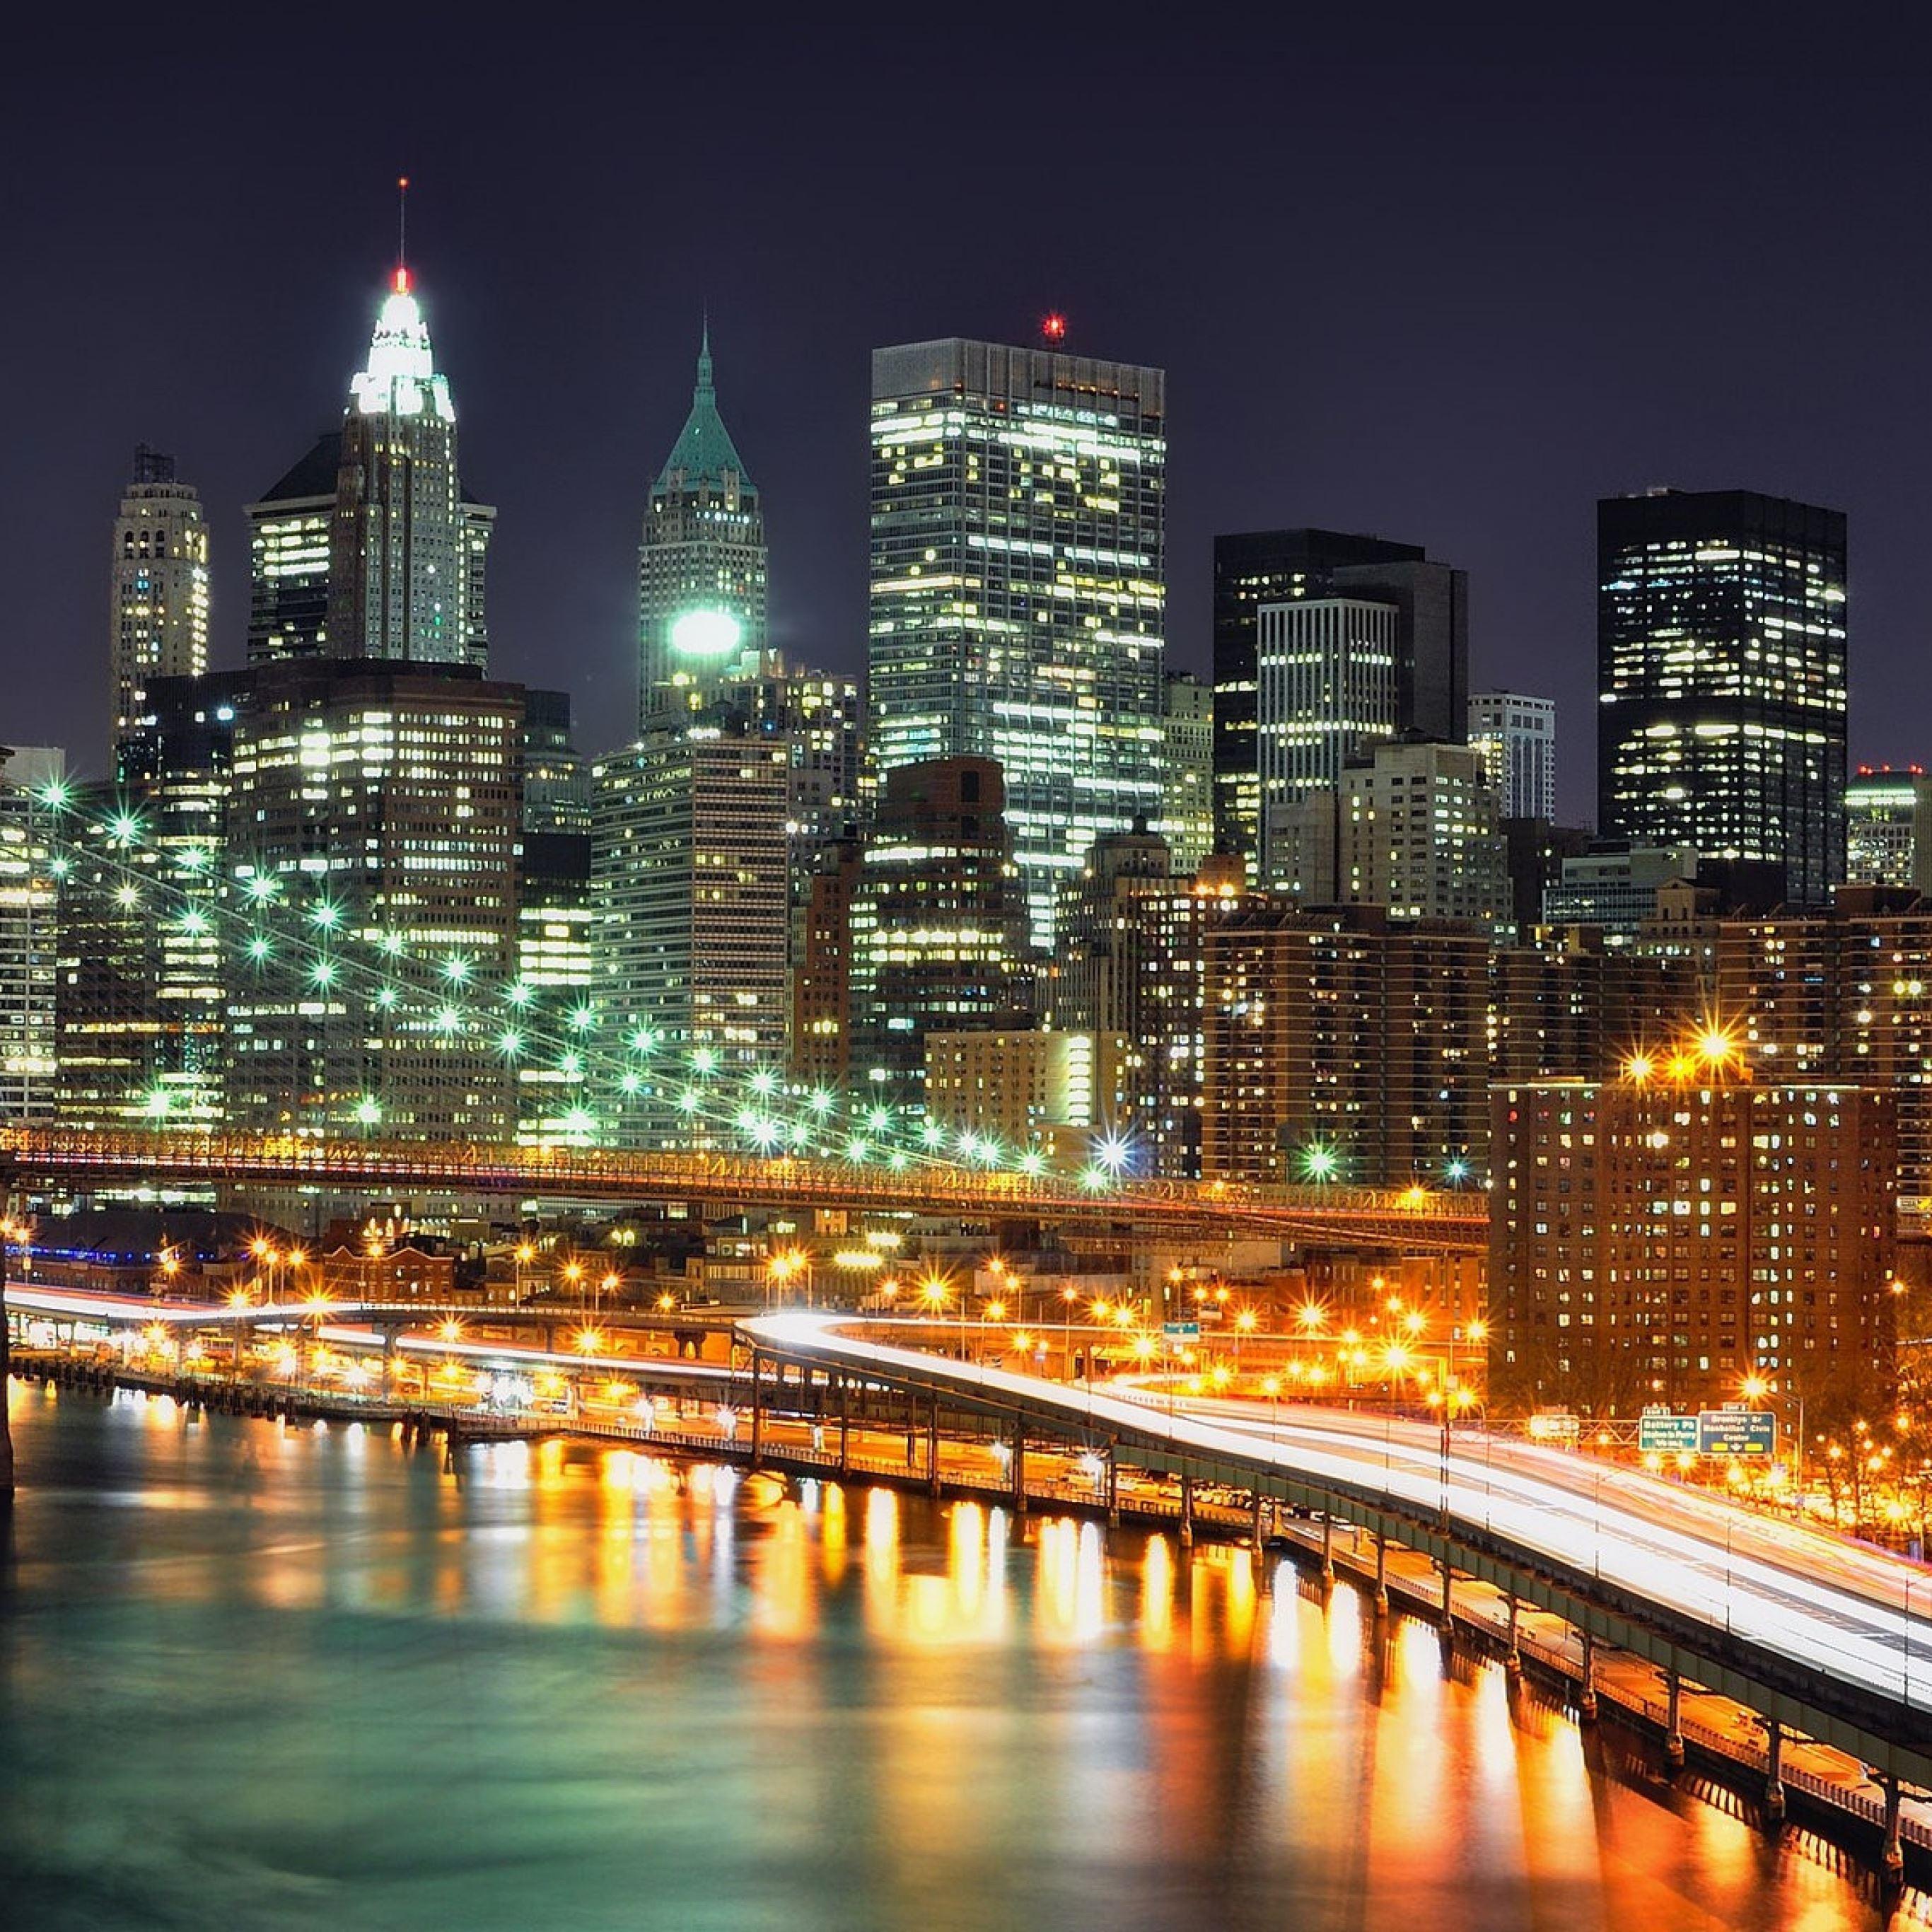 Bridge night lights iPad Pro wallpaper